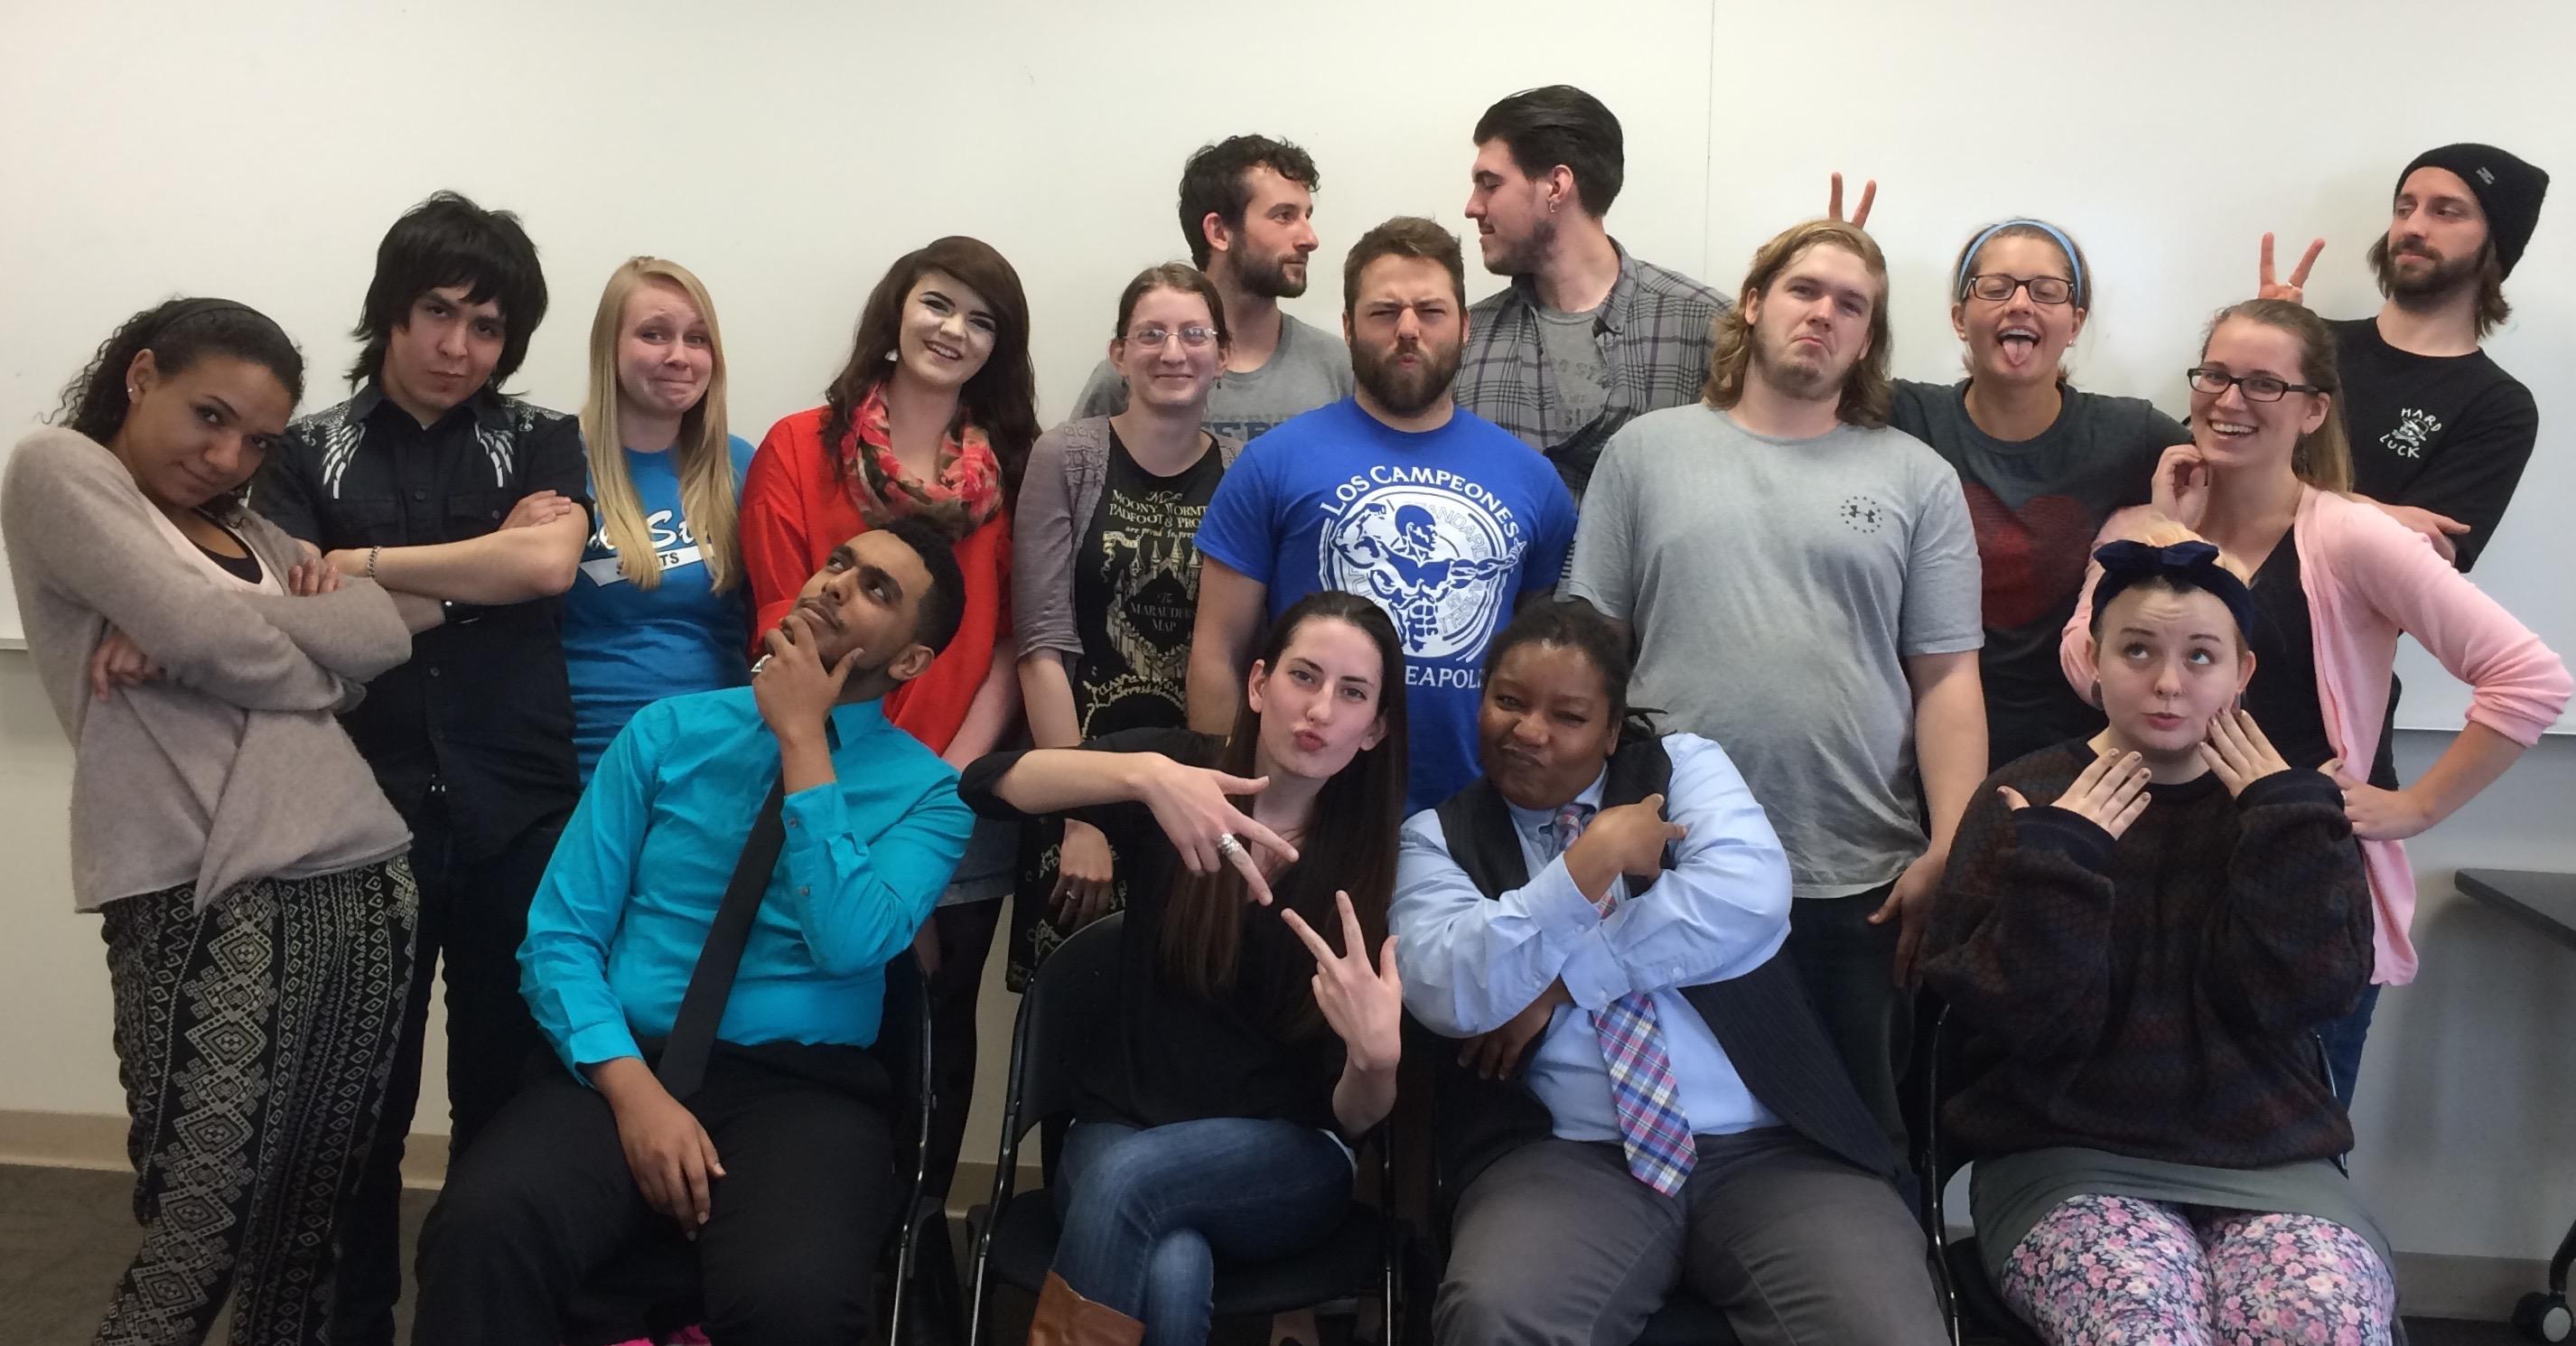 Sociology seniors strike a pose on the last day of Senior Seminar.